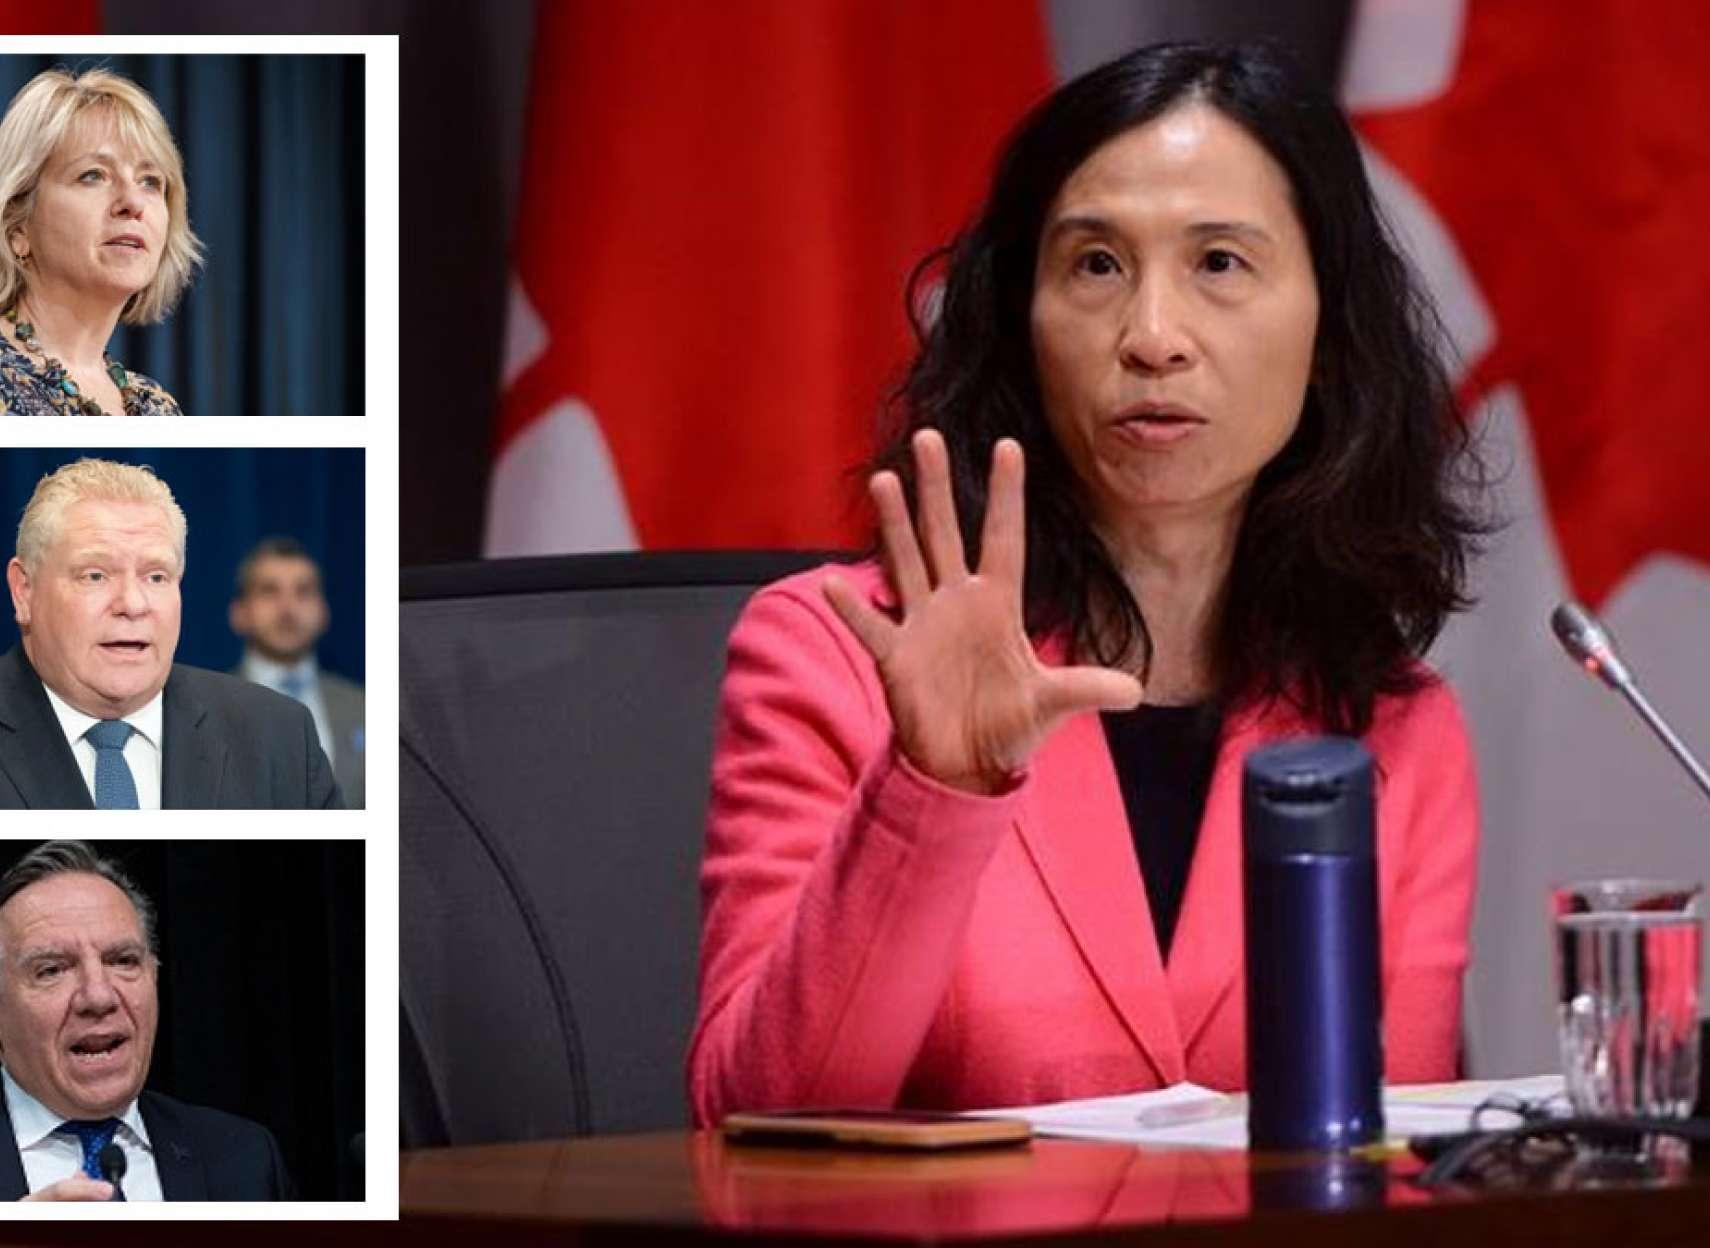 اخبار-کانادا-رعایت-نکنید-روزی-۶۰۰۰۰-کرونایی-خواهیم-داشت-اعلان-نیمه-بسته-شدن-بریتیش-کلمبیا-